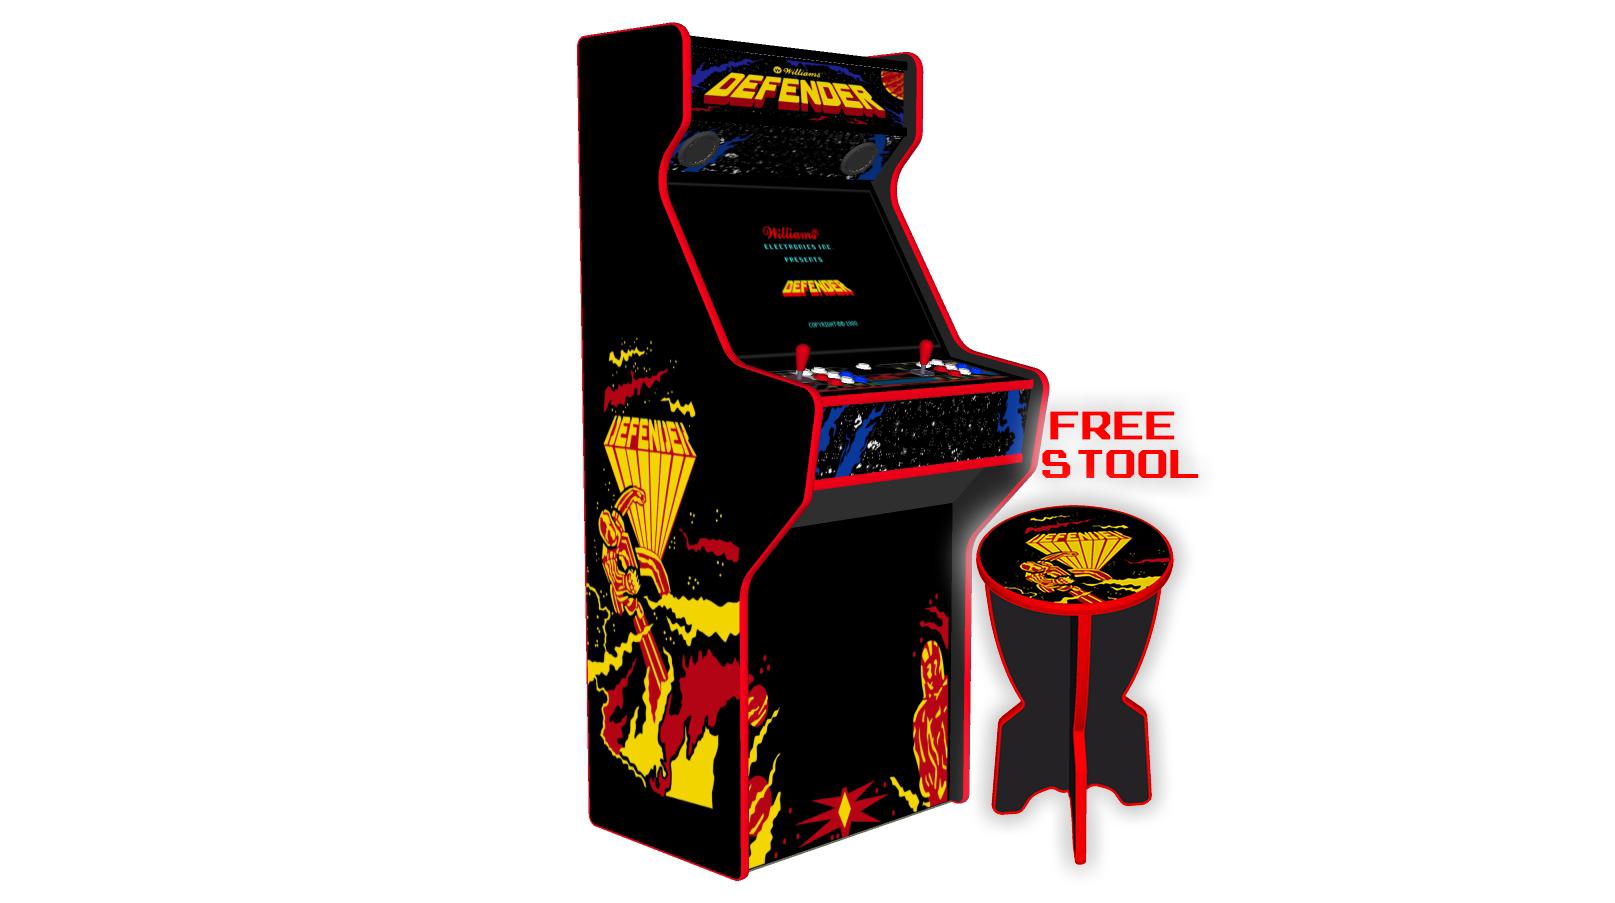 Defender-27-Inch-Upright-Arcade-Machine-American-Style-Joysticks-Red-Tmold-Left-15k-games-free-stool